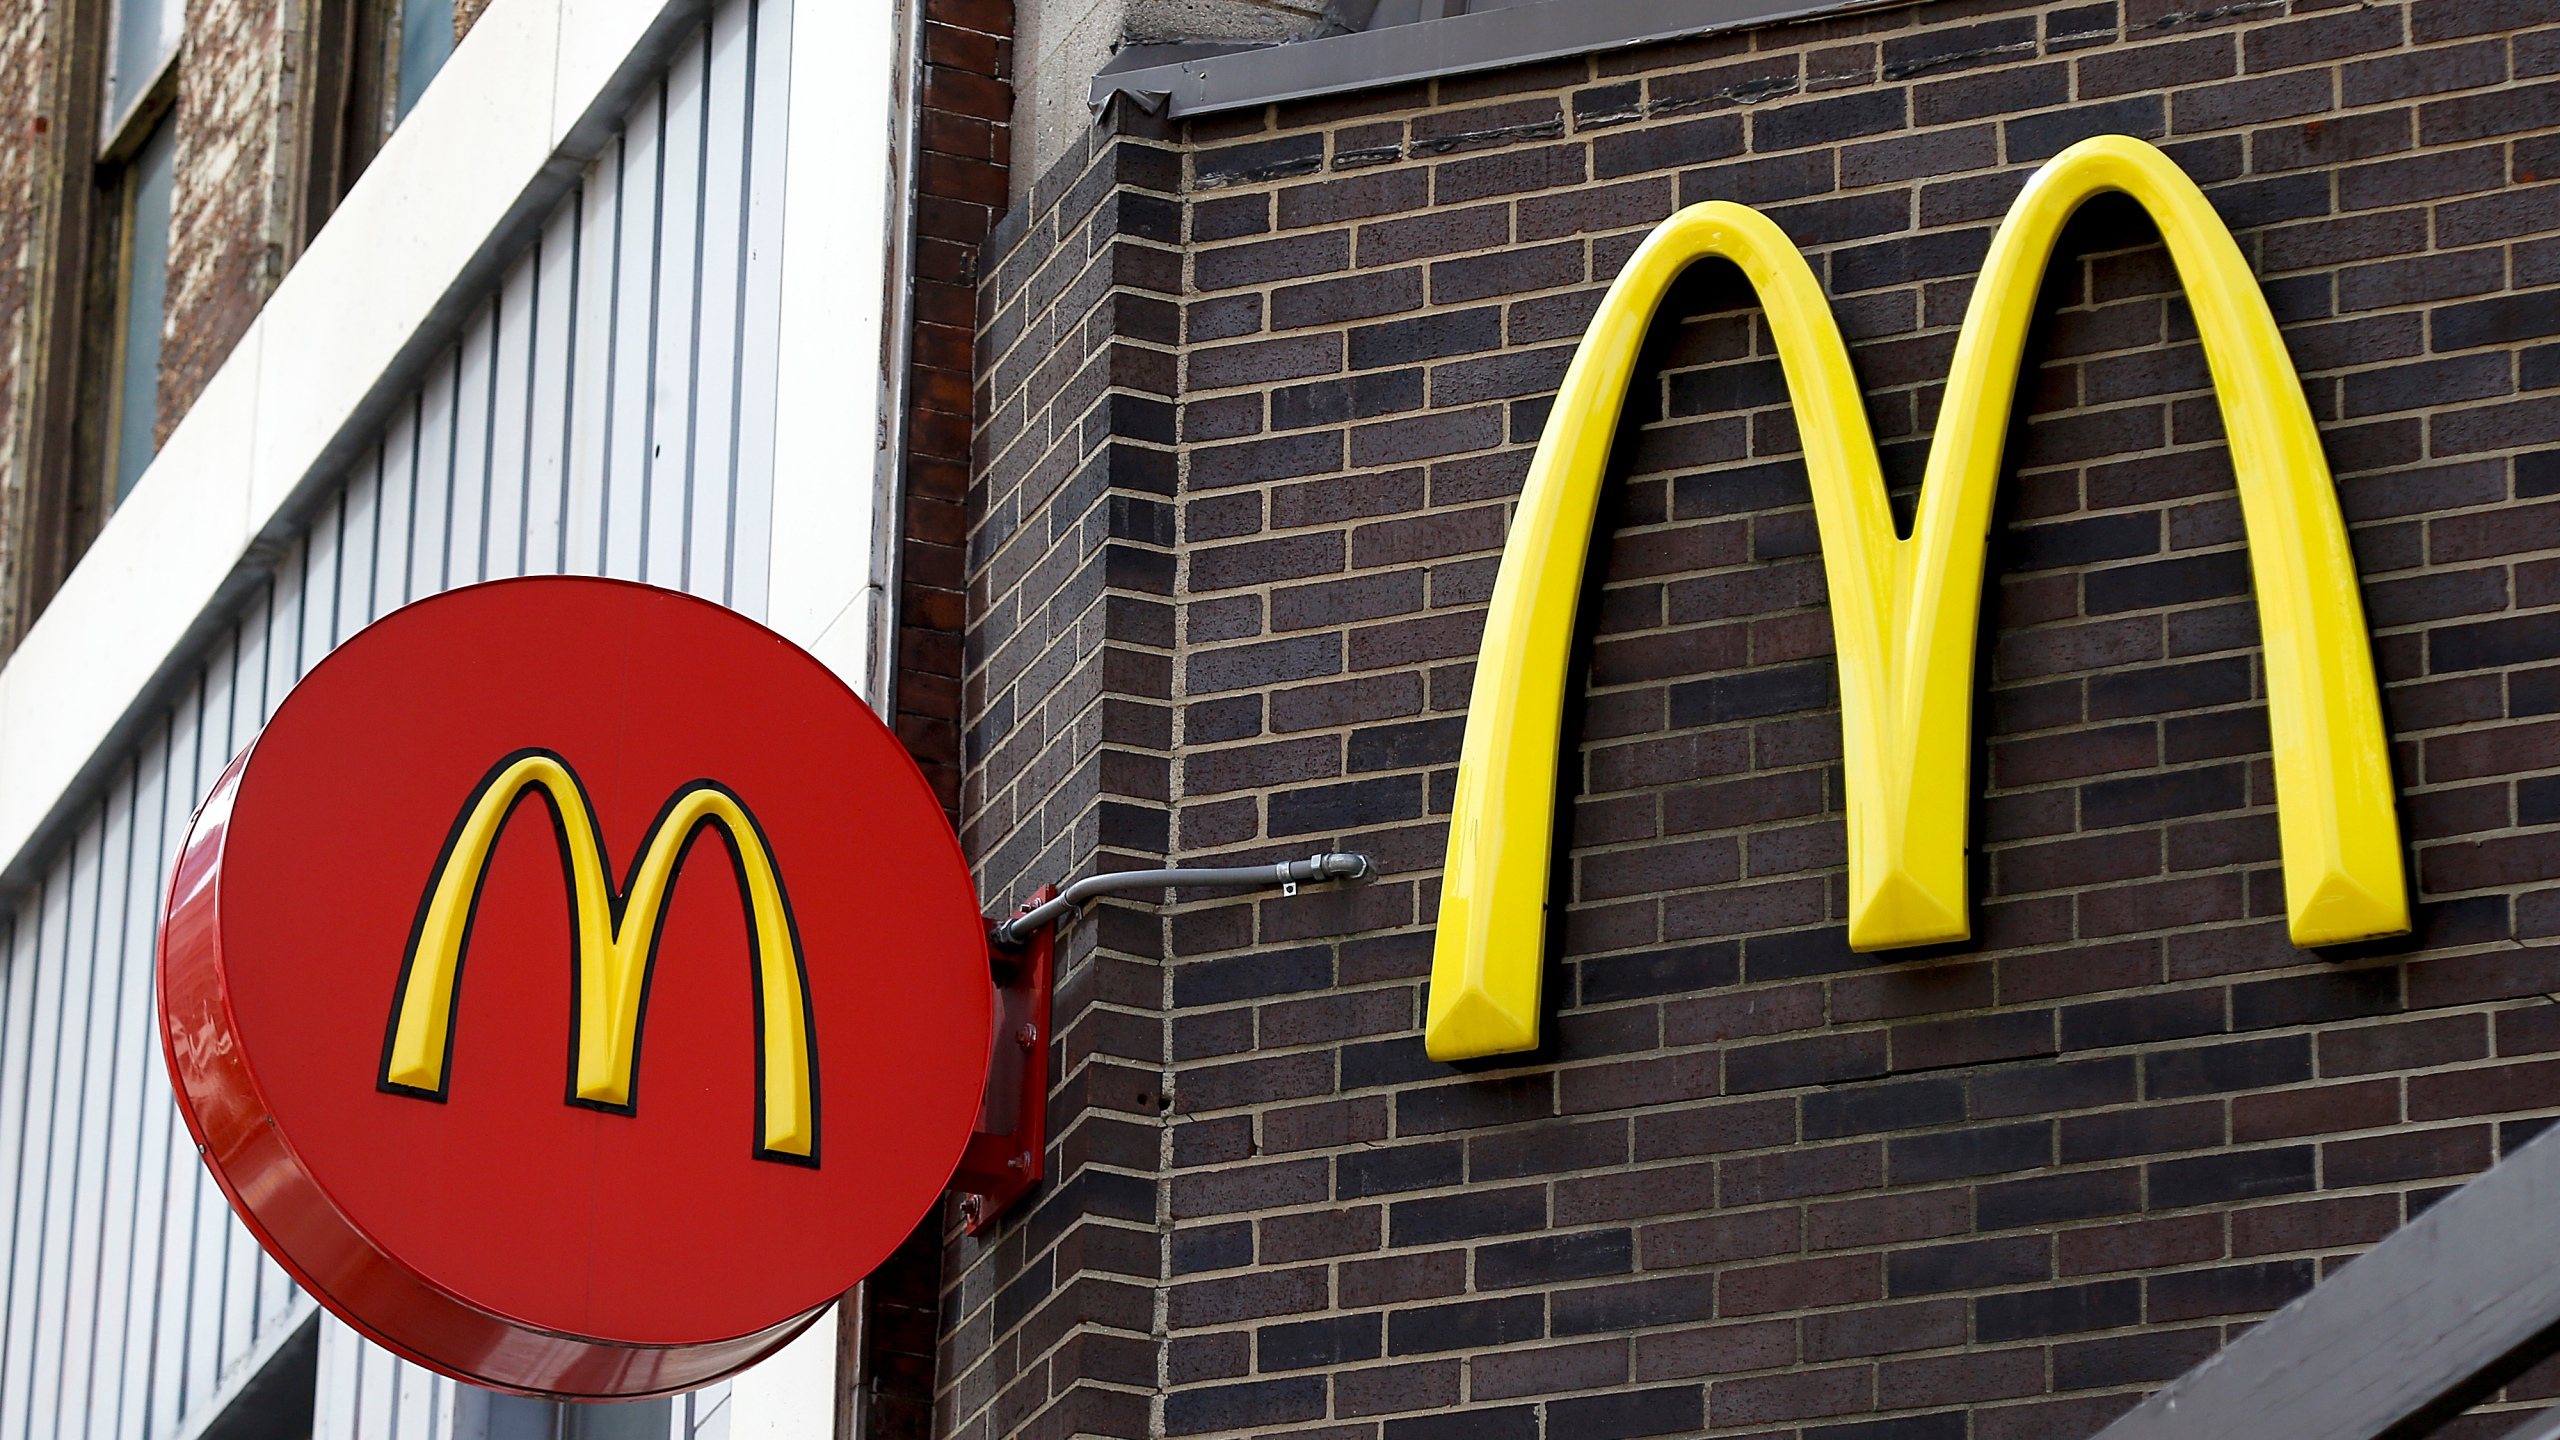 McDonalds_Fresh_Beef_76459-159532.jpg83484030